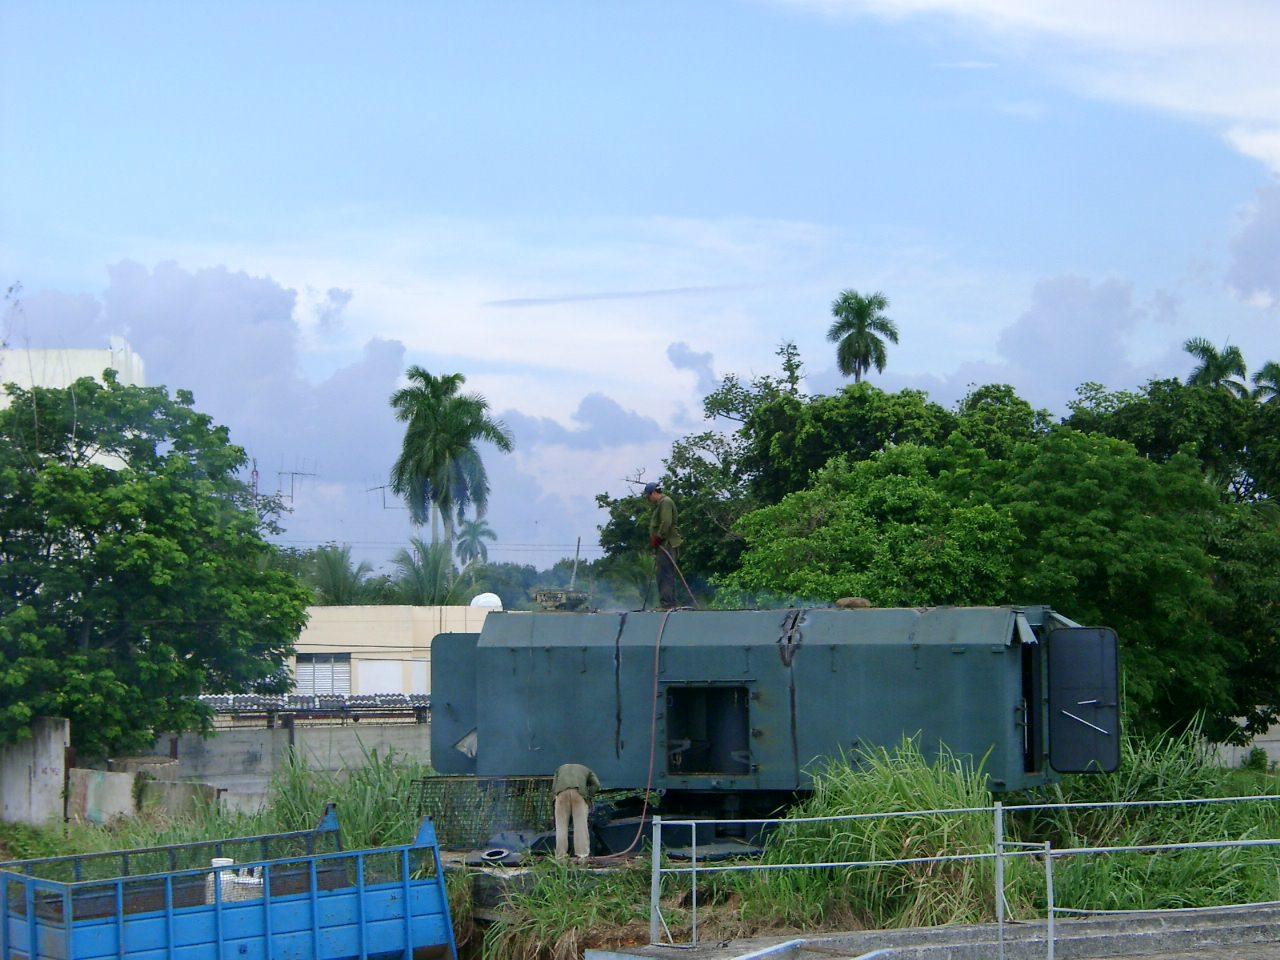 Кунг на территории первого отдела, за ним видно здание клуба 20 батальона